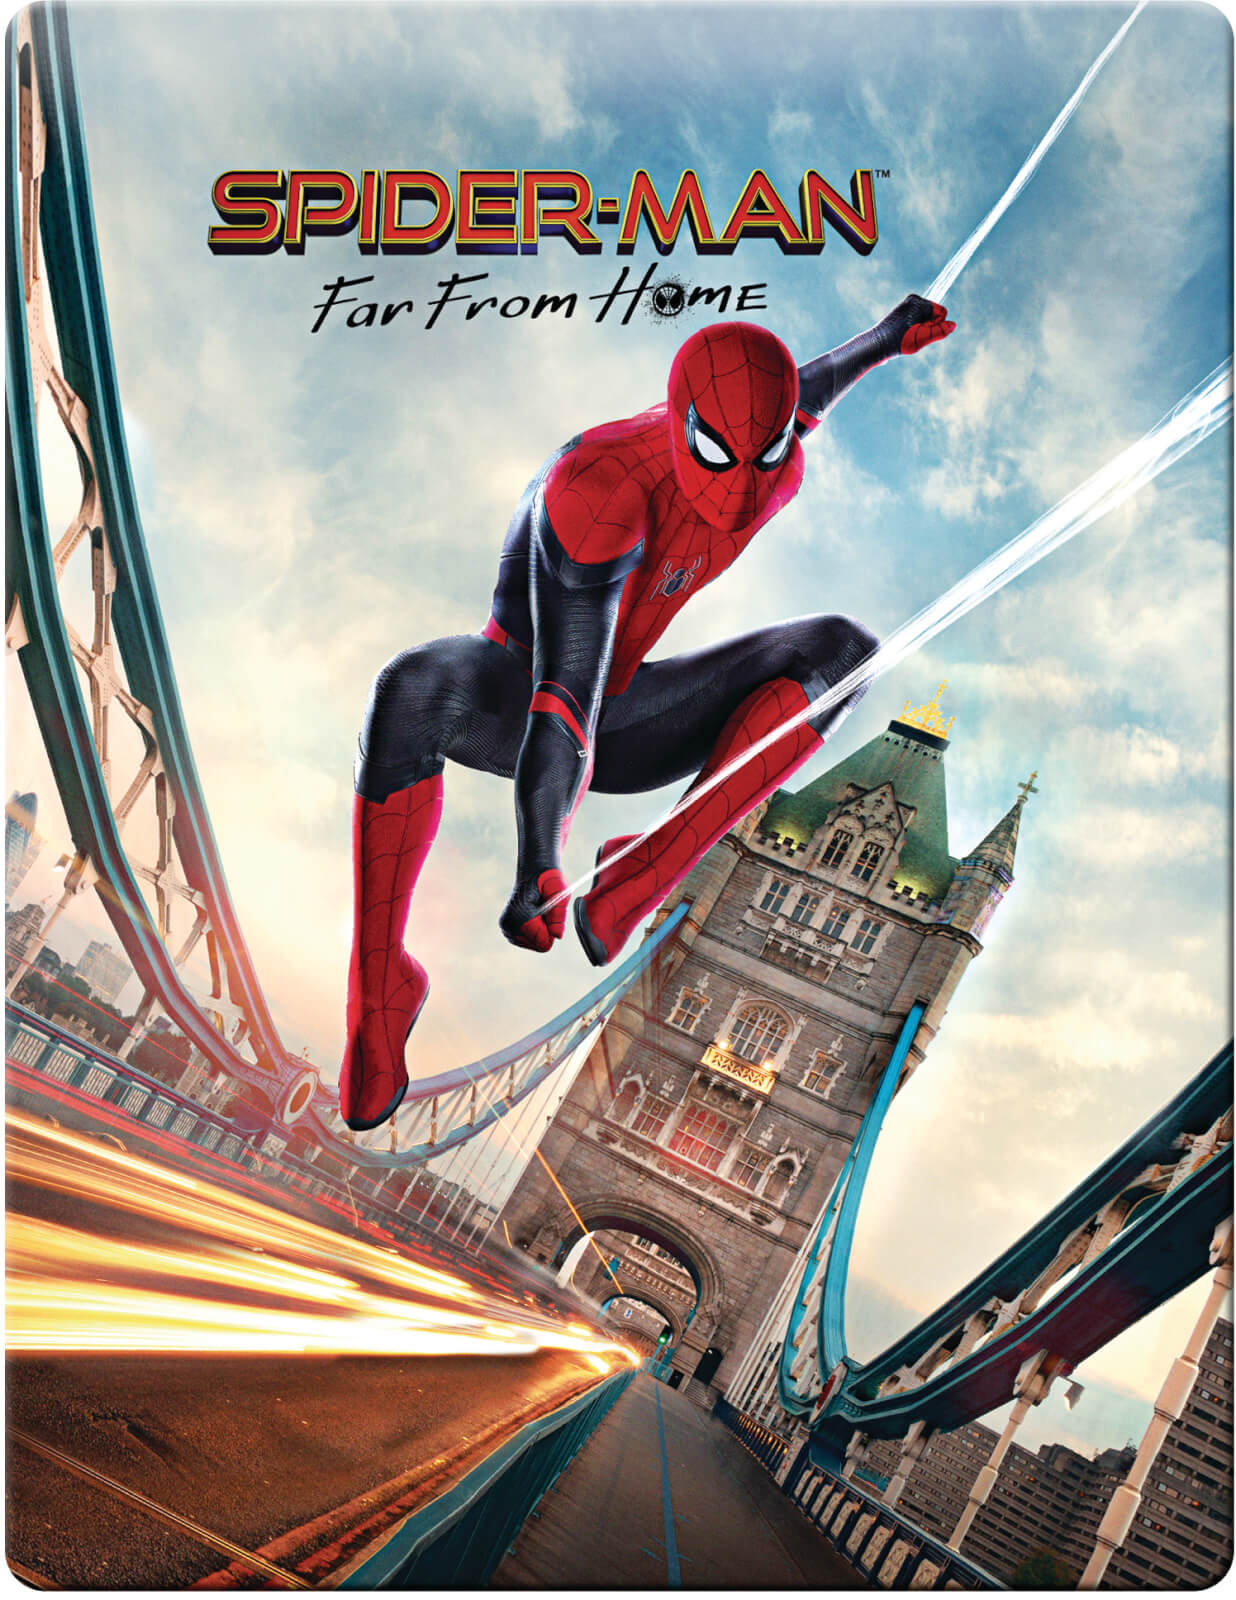 Spider-man-Far-From-Home-steelbook-zavvi-1.jpg